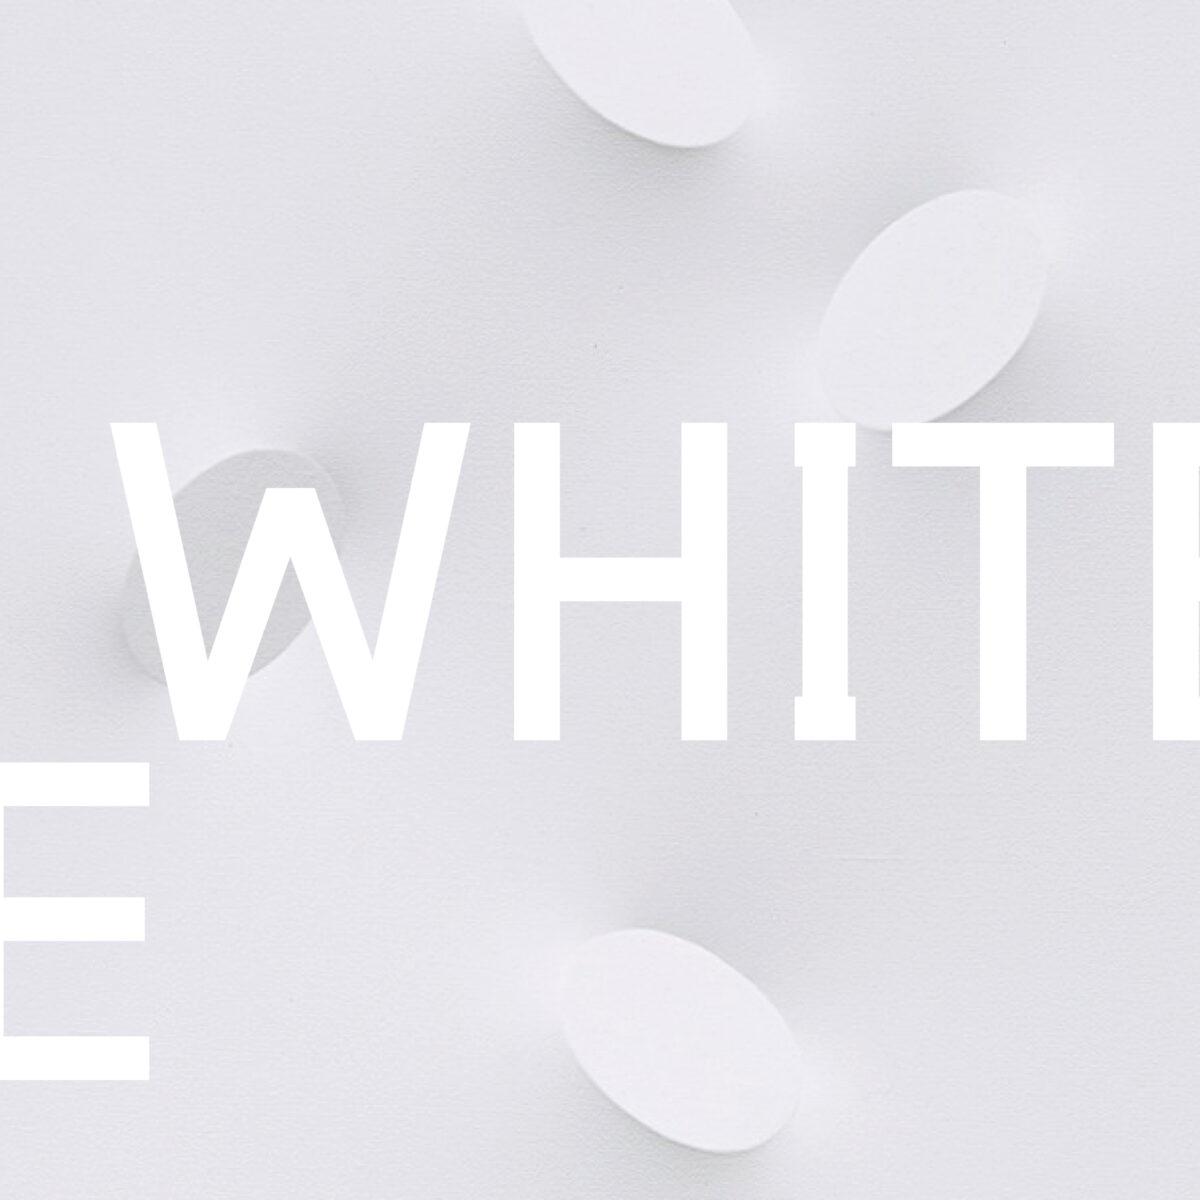 PC Filterstory Coloroftheweek White 001